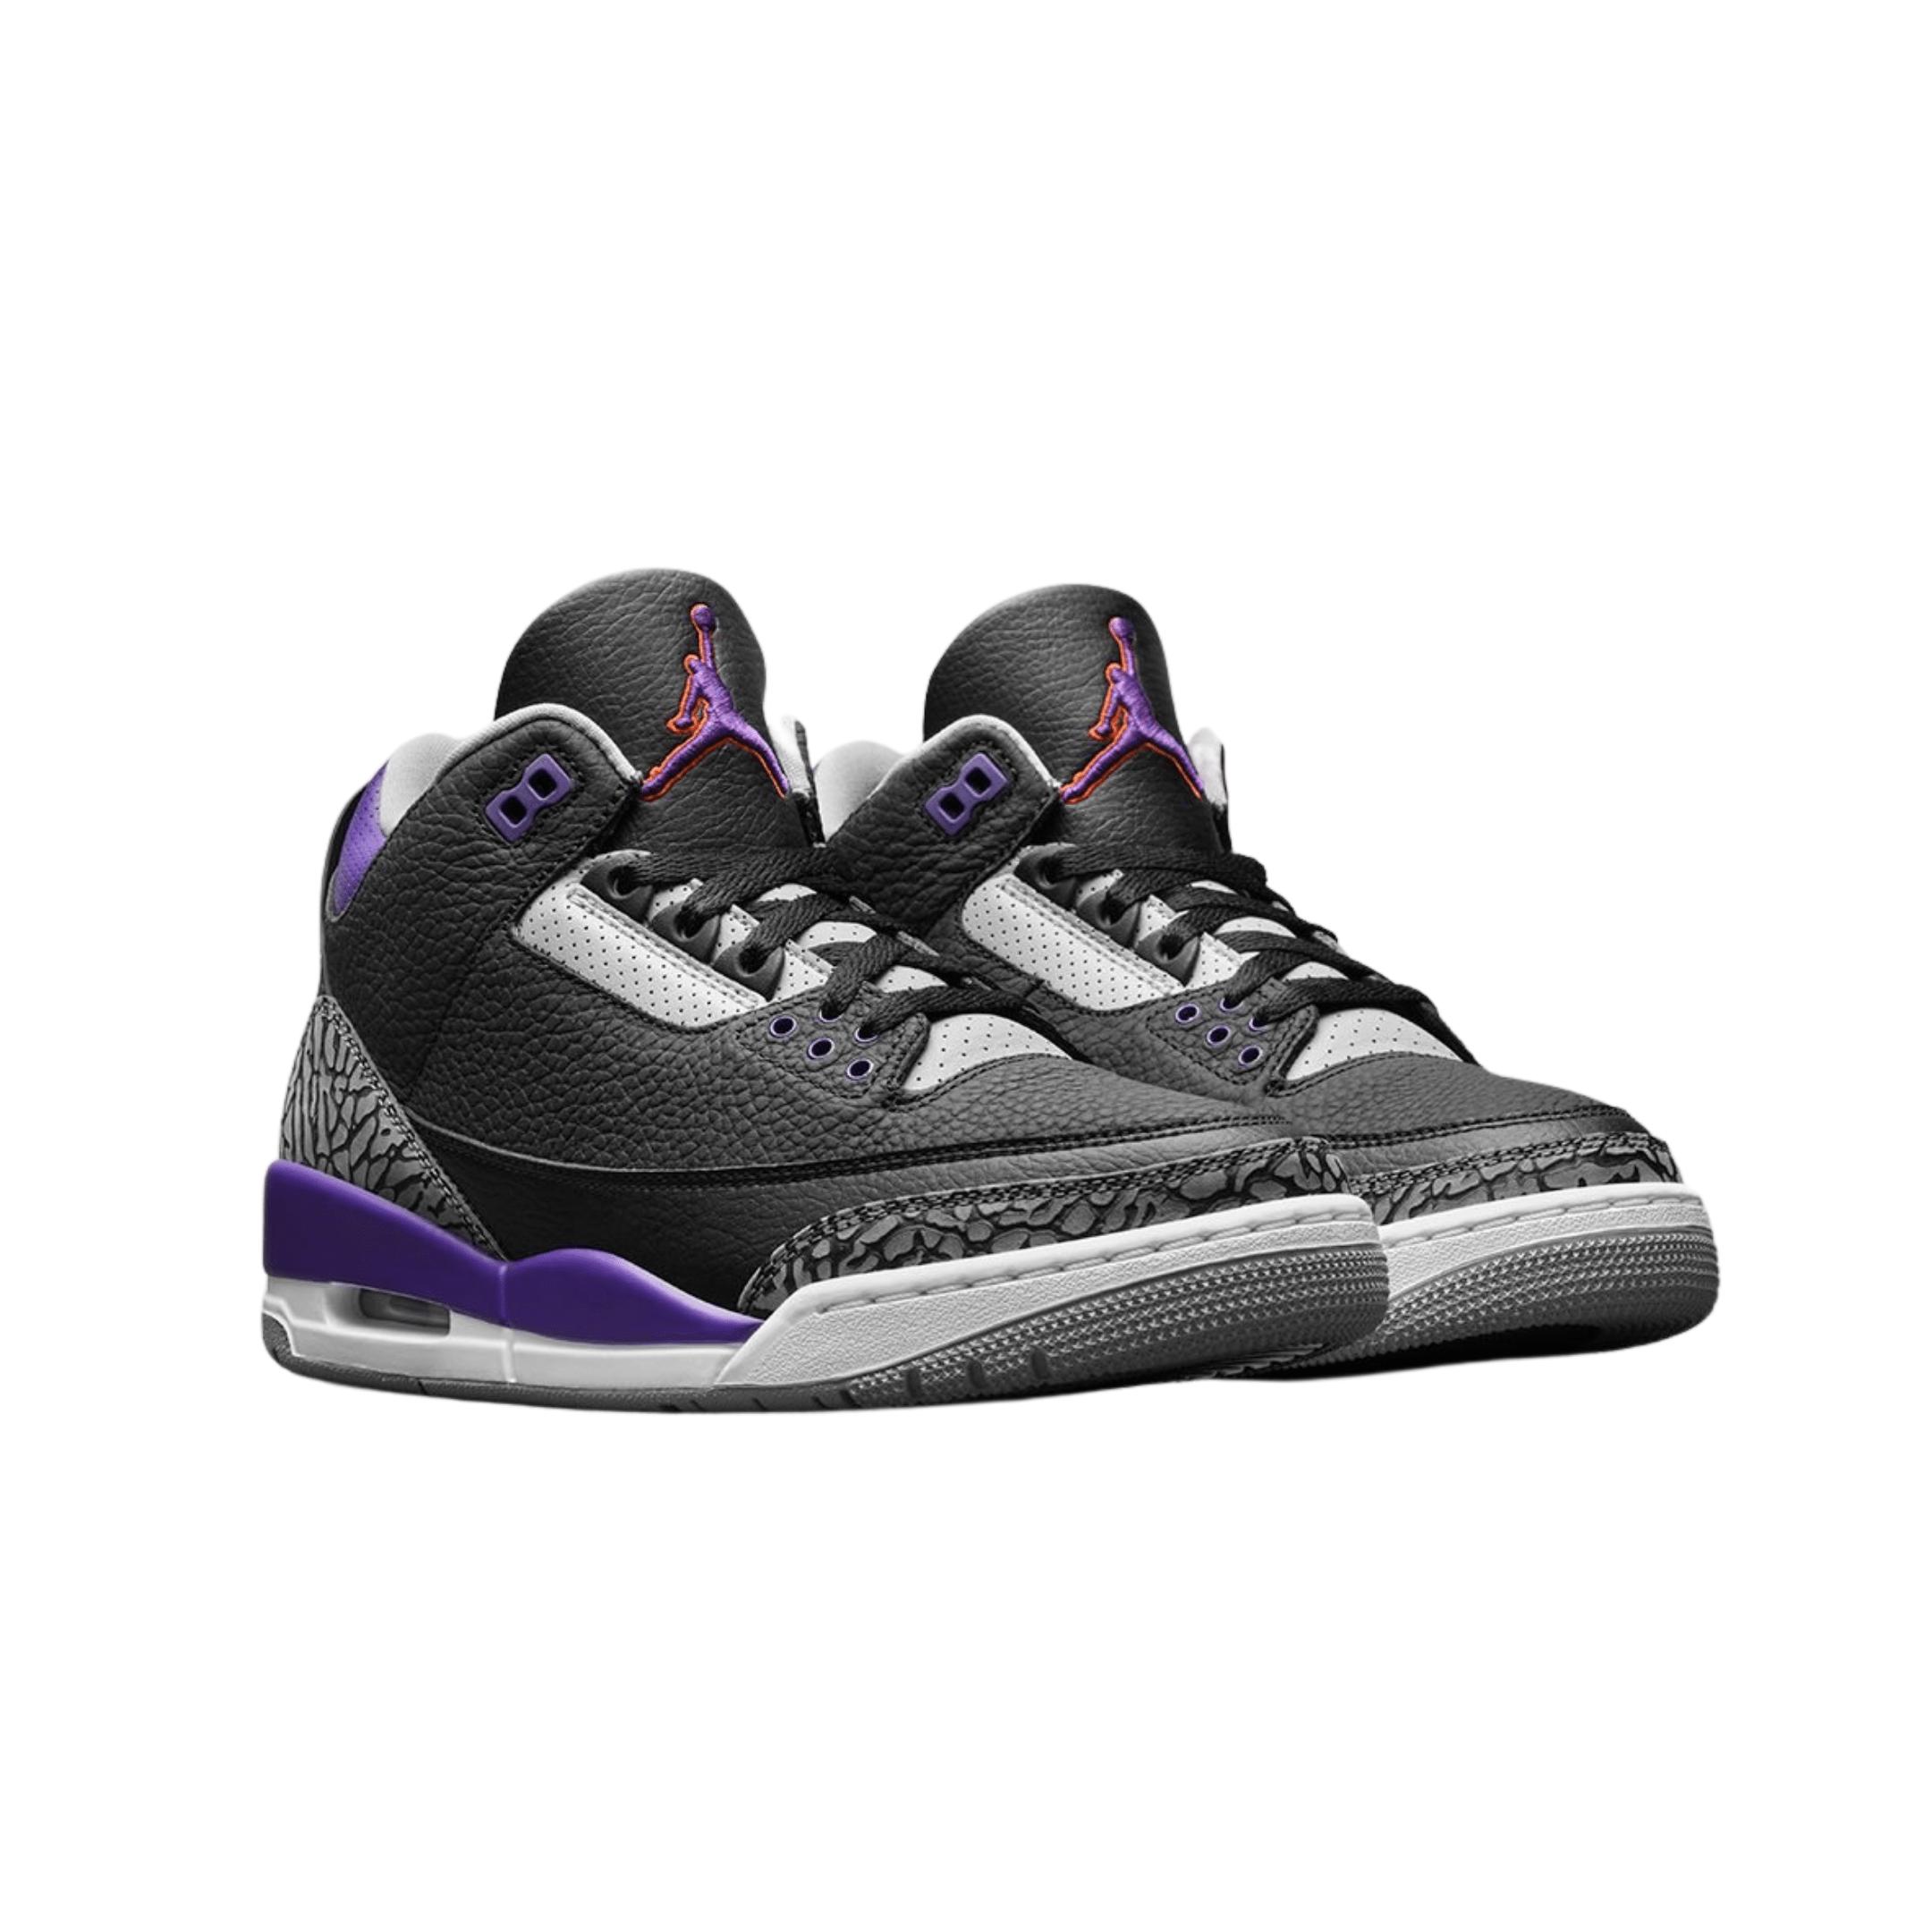 Nike Air Jordan 3 Black Court Purple-2